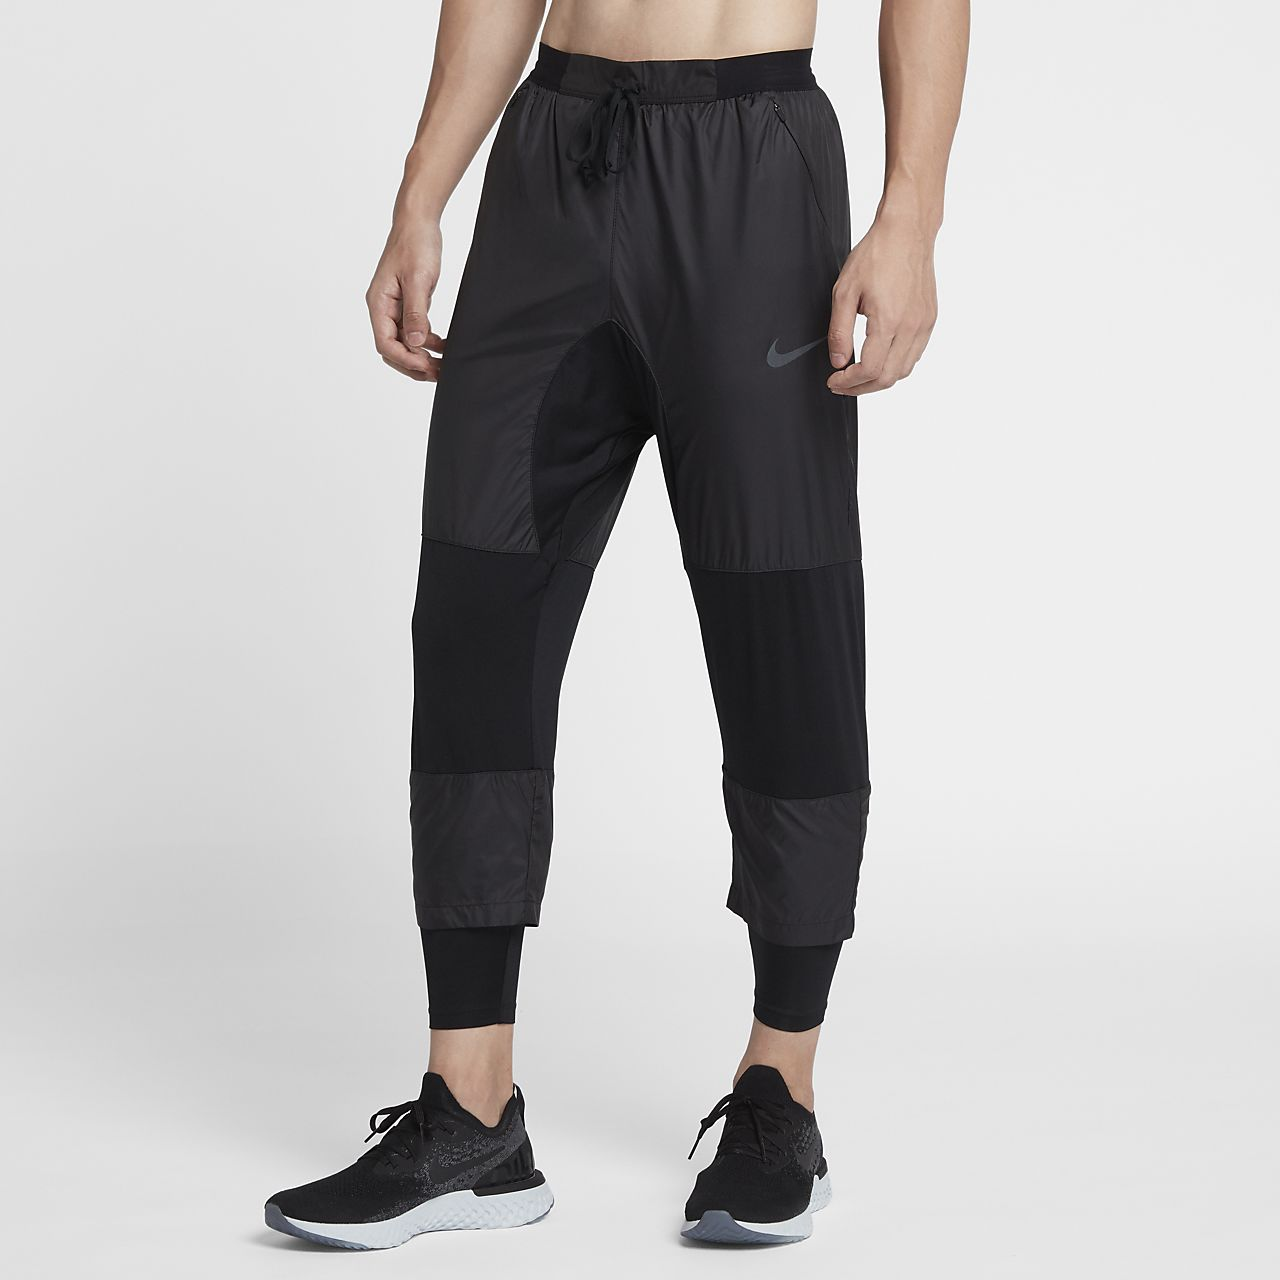 e61882a5b1652f Nike Run Division Tech Men s Running Trousers. Nike.com ID